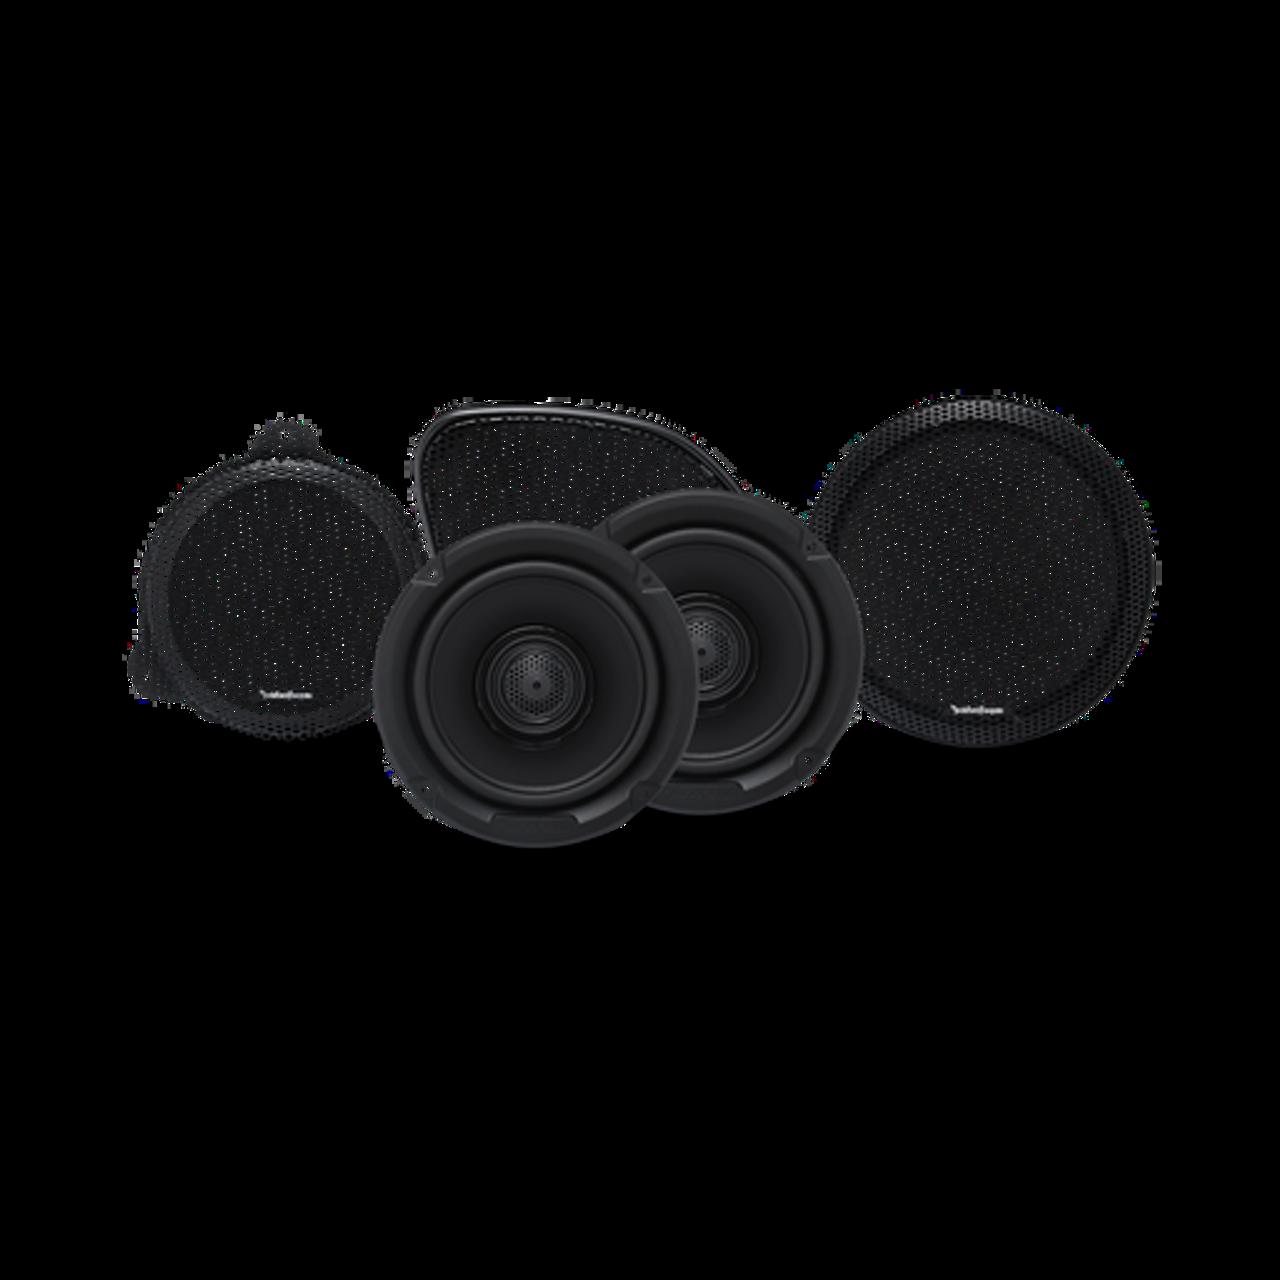 WIX WA9523 Car Air Filter Round Replaces C17237 CA10414 LX2059